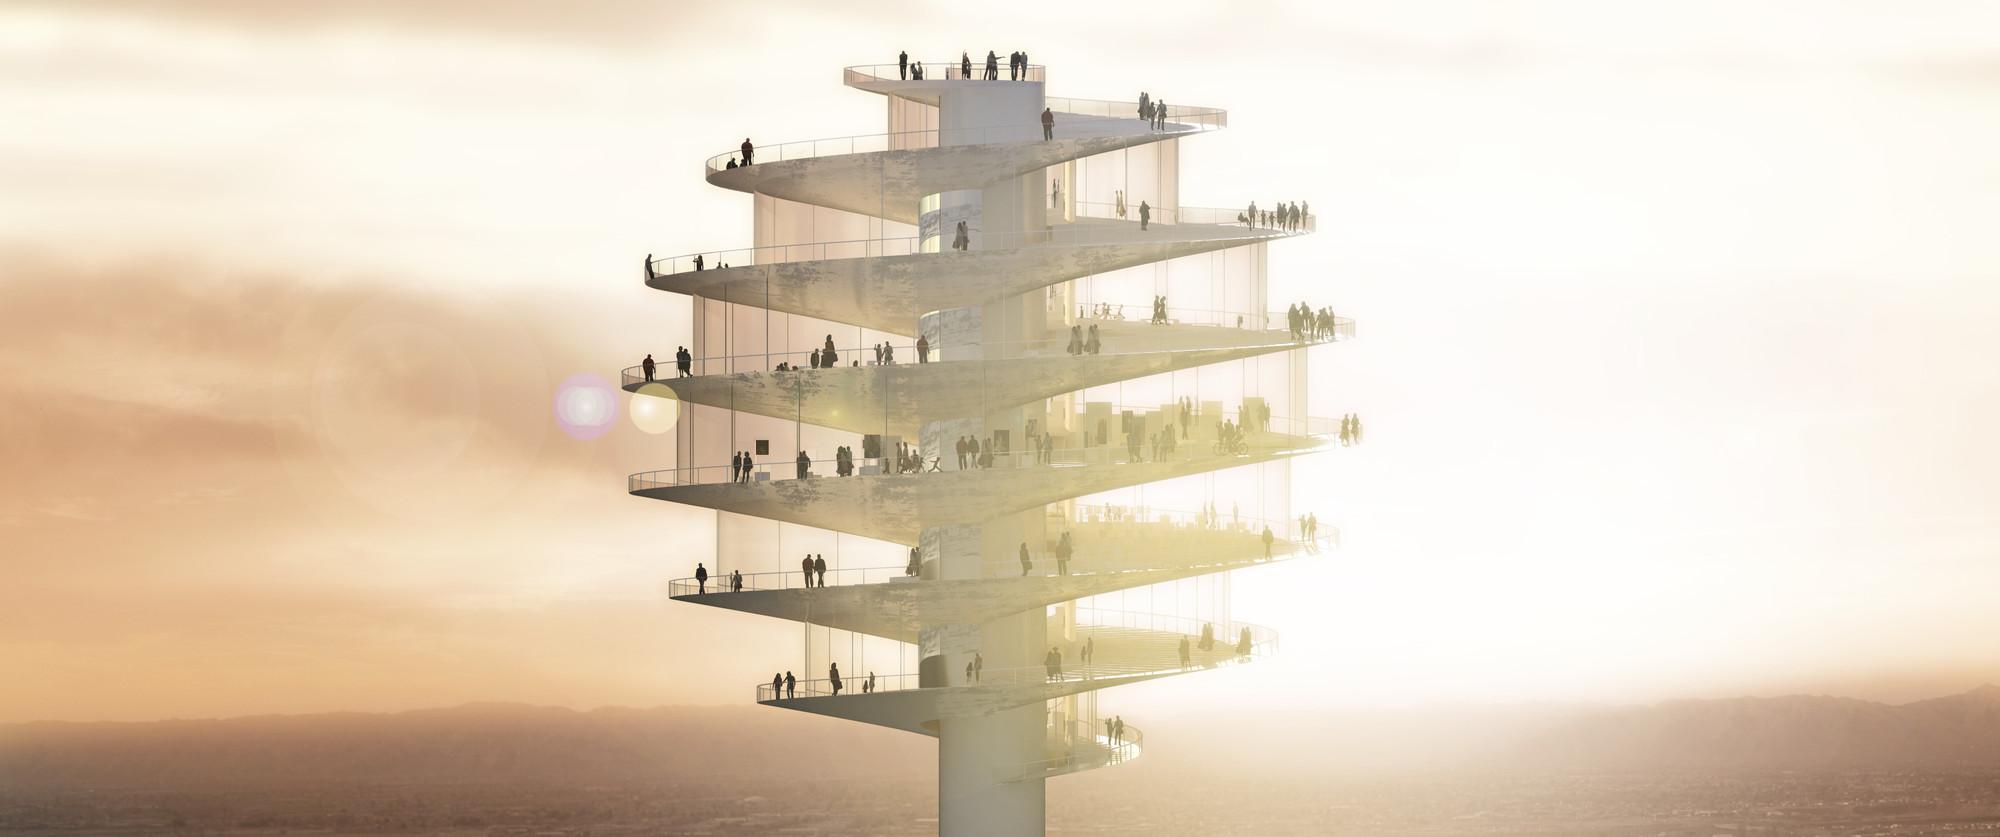 Phoenix Observation Tower / BIG, Courtesy of BIG Architects